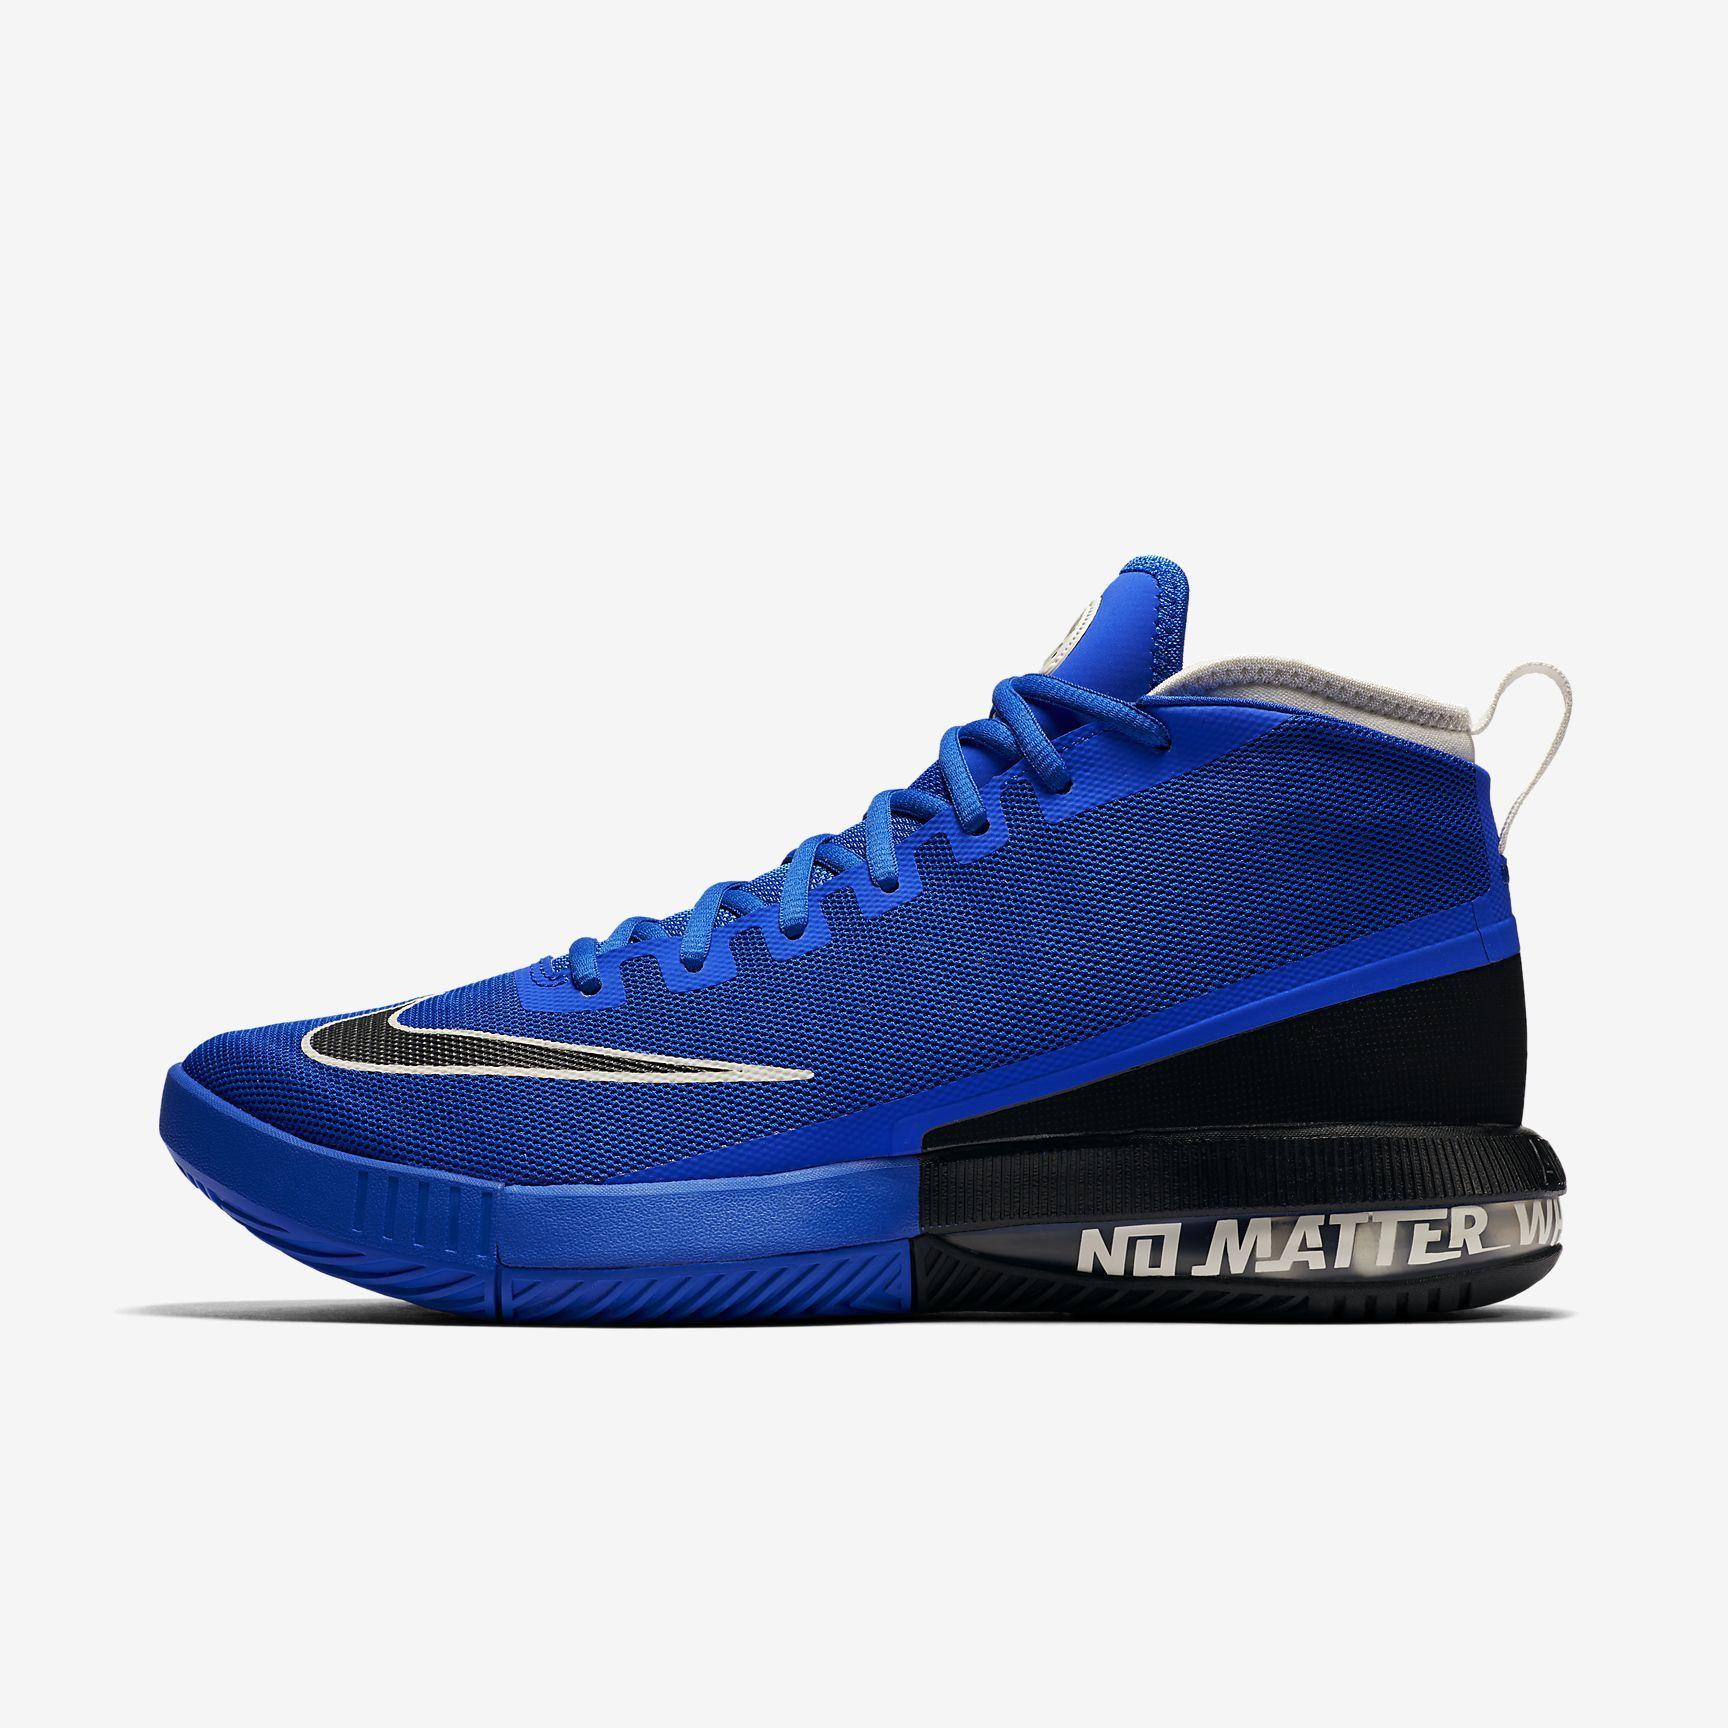 reputable site 79231 4e8f2 Nike Air Max Dominate Anthony Davis